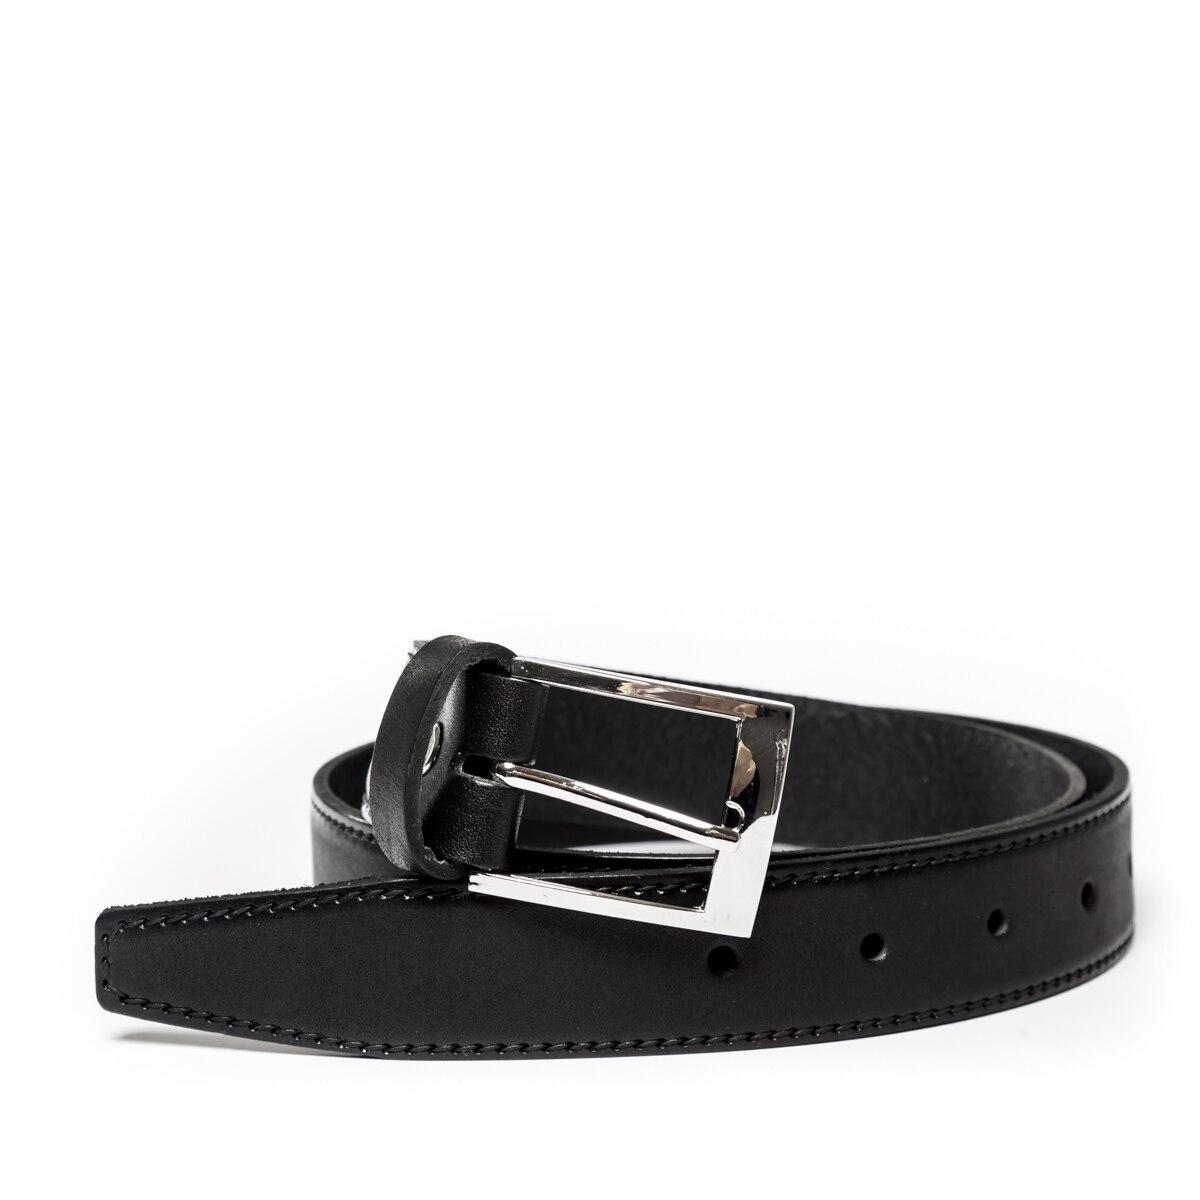 LAKESTONE belt leather teen Besom Black for boy belt leather men s carpenter cr700 7 6 black black